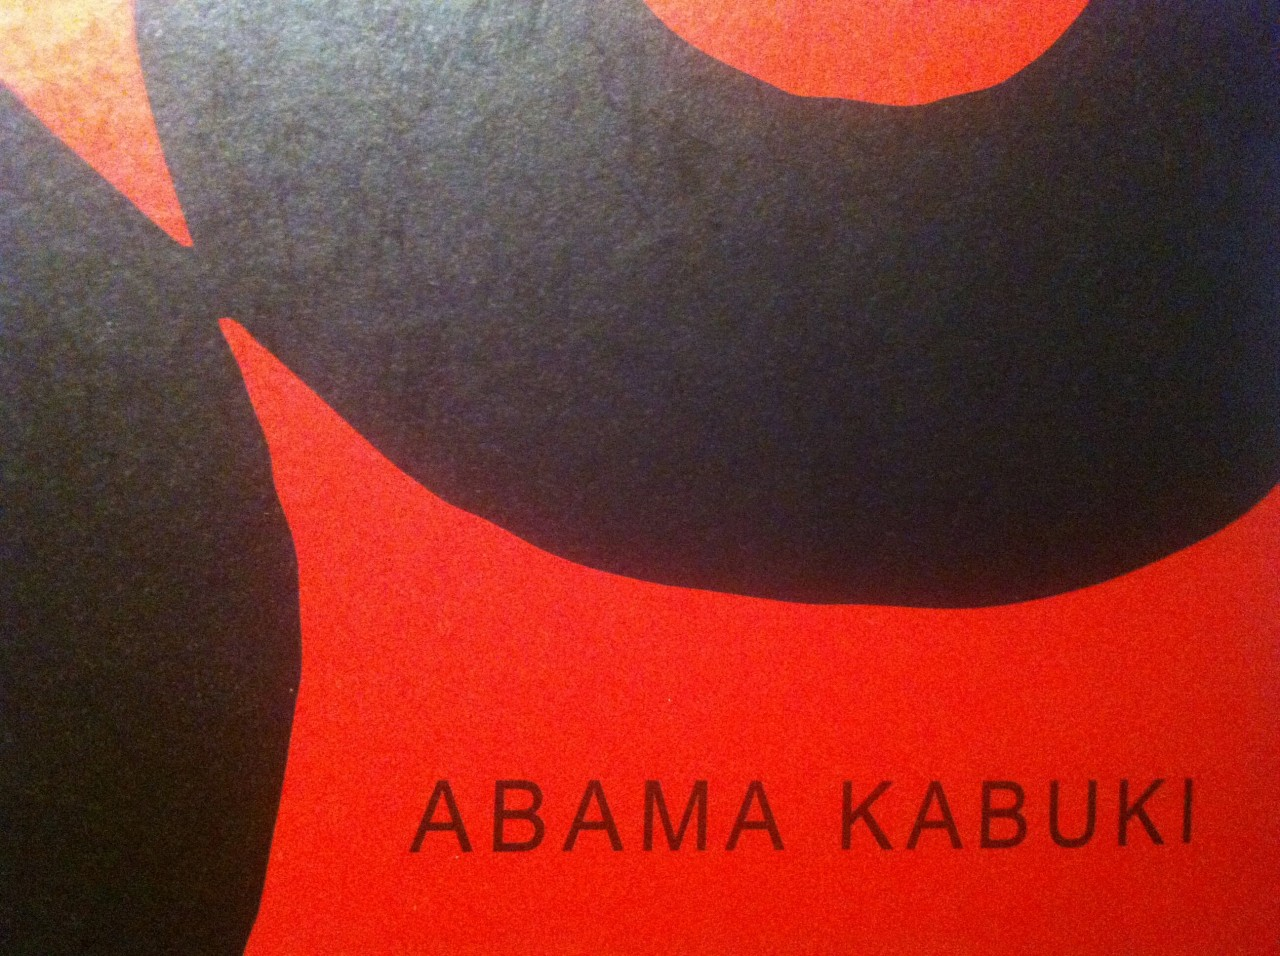 Kabuki Abama